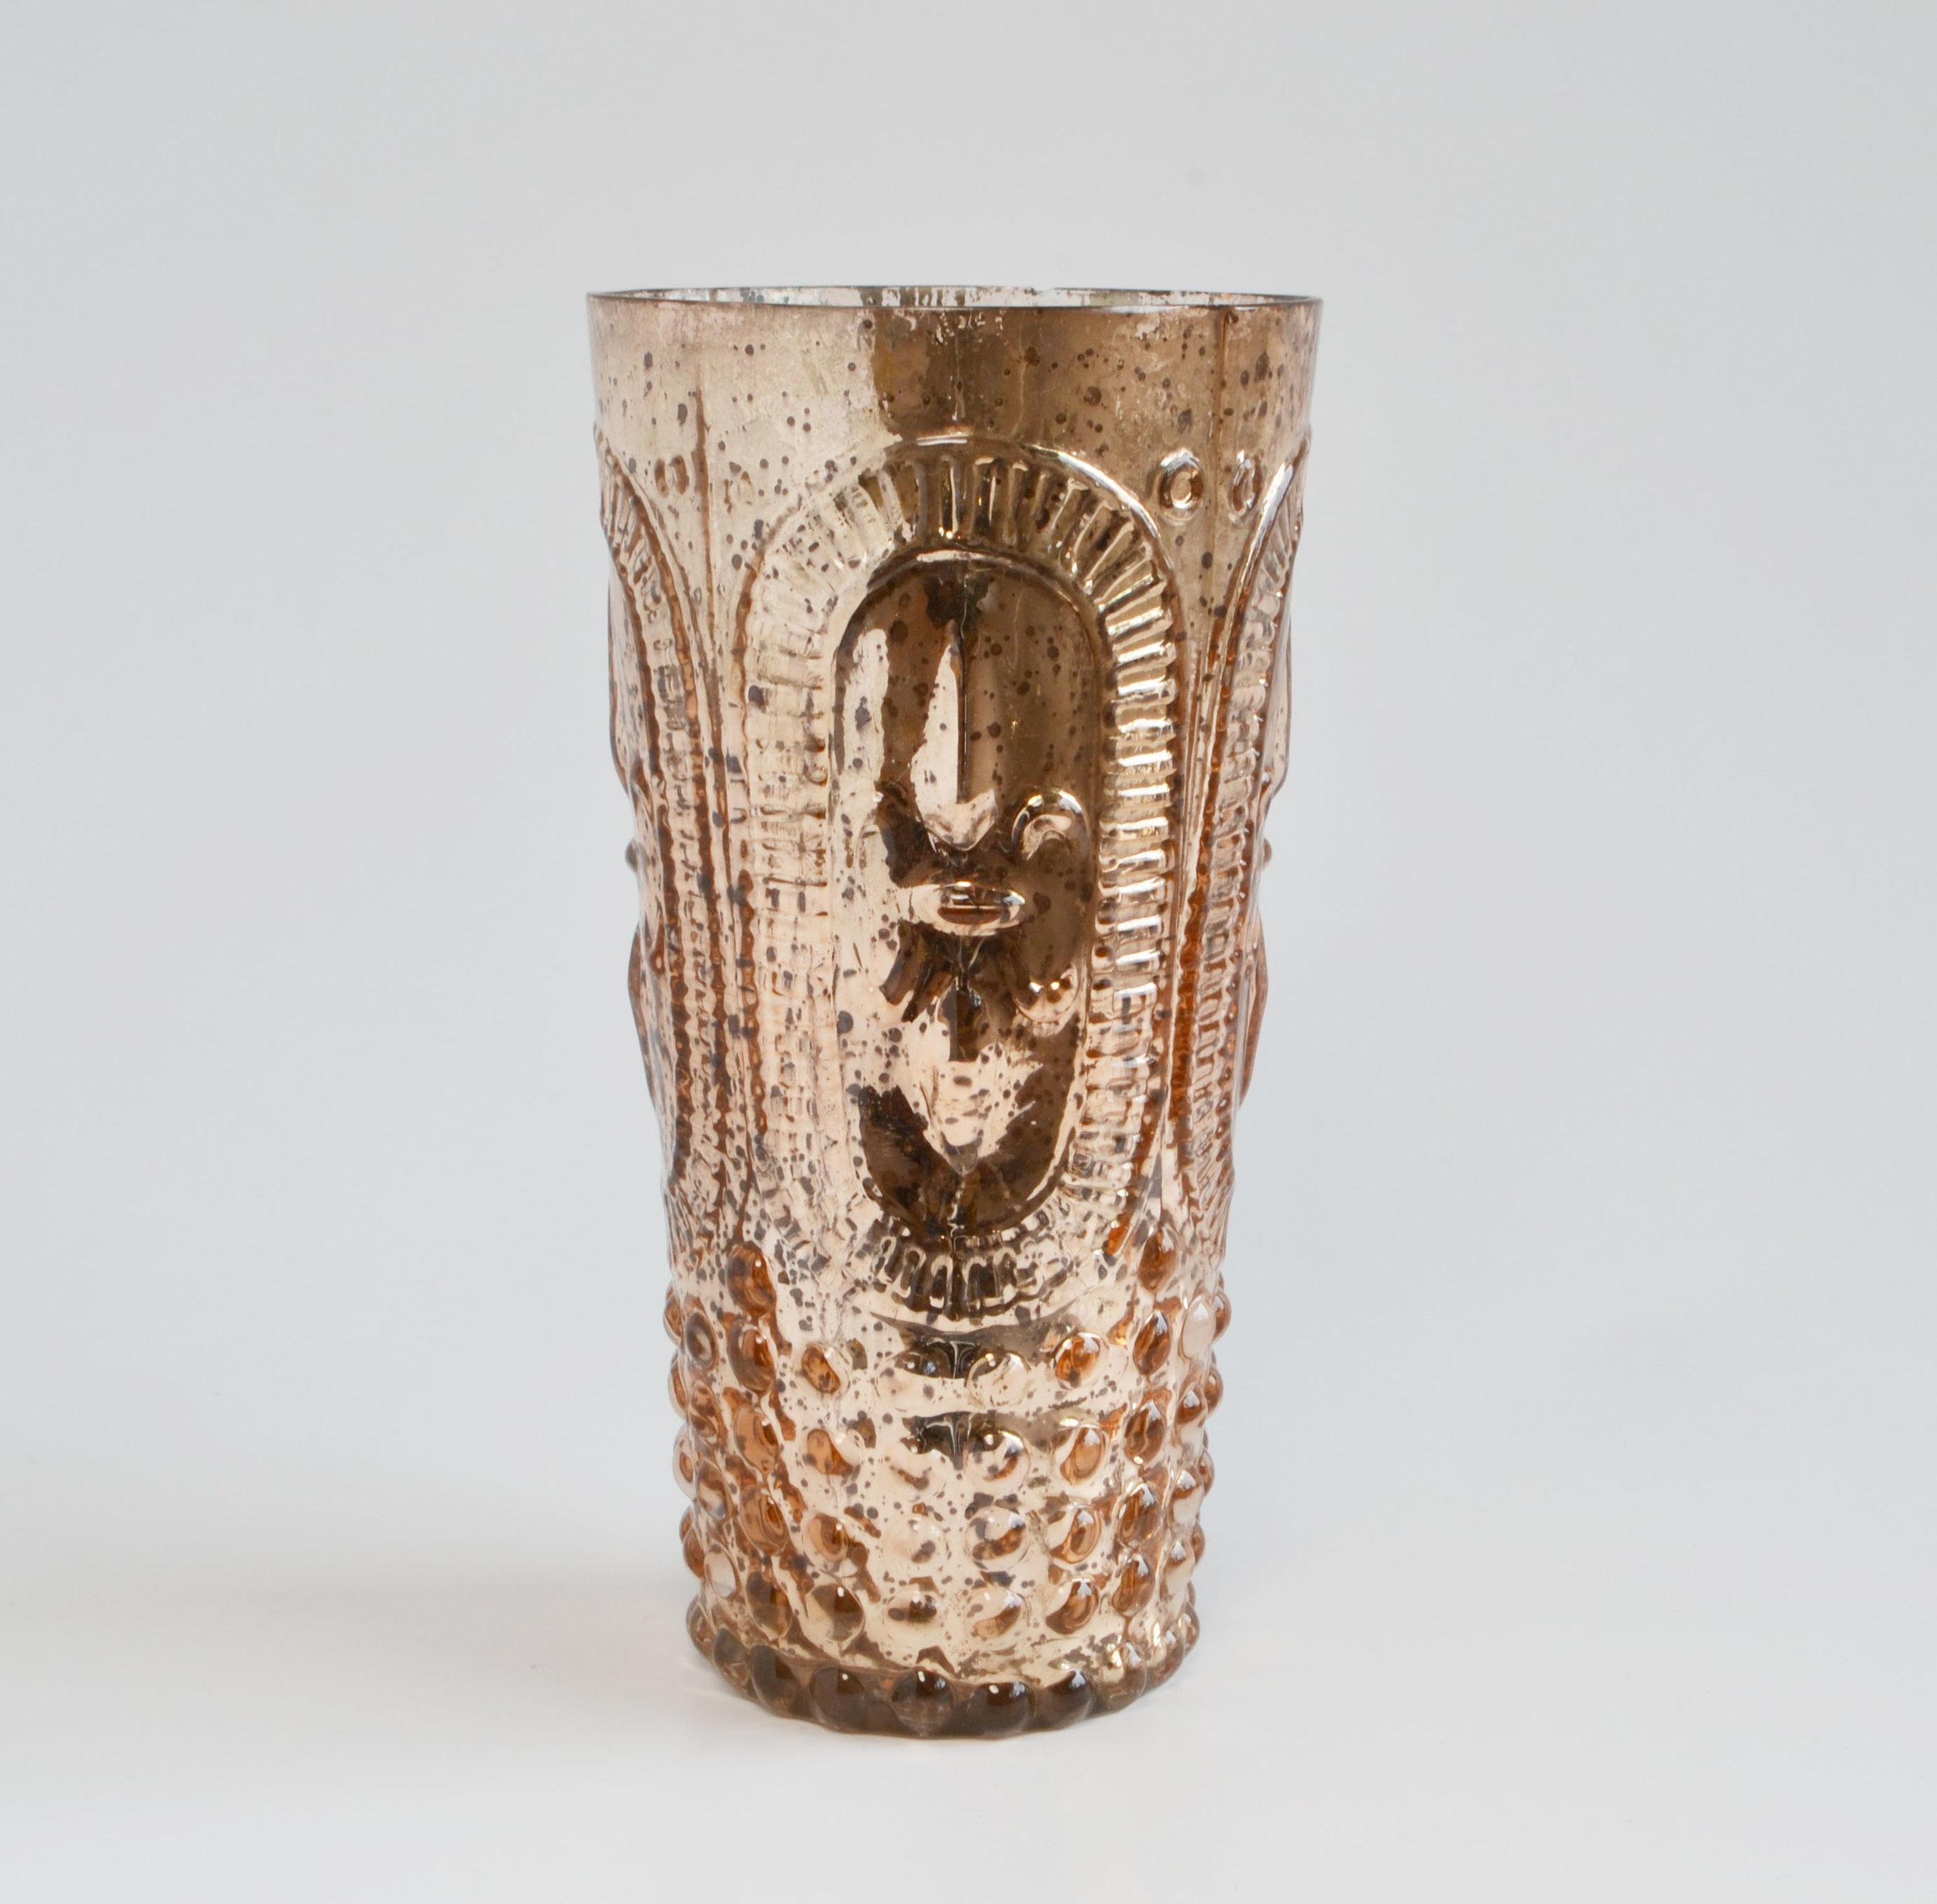 Rose Gold Votive/vase tall   Quantity: 12  Price: $6.50